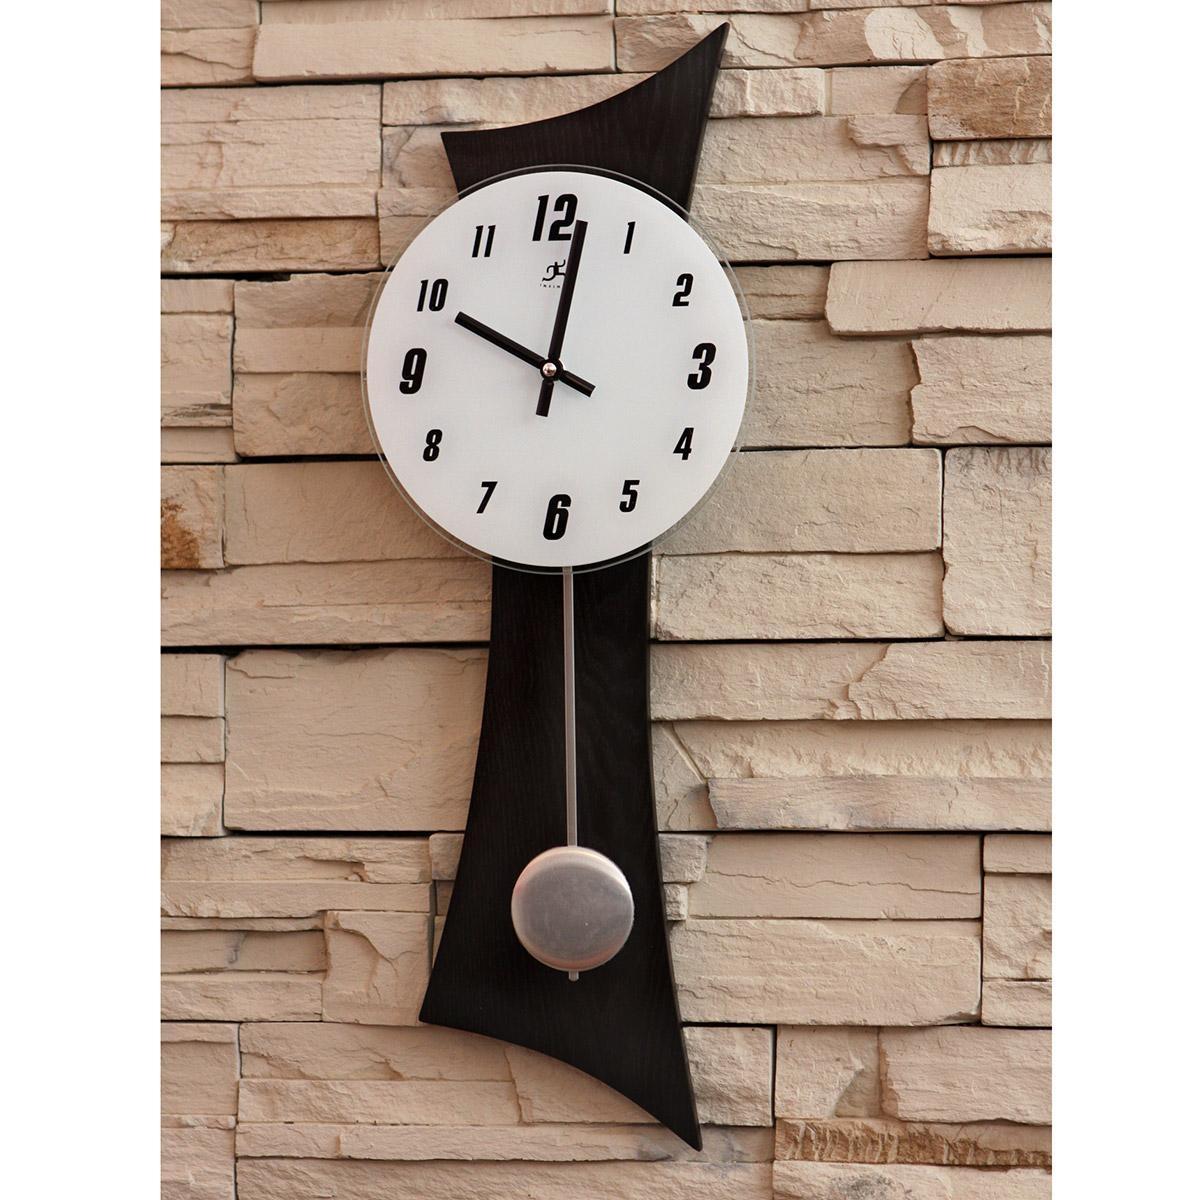 Splendid Deco Wall Clock 92 Deco Wall Clock Factory Large American With Regard To Art Deco Wall Clocks (Image 17 of 20)